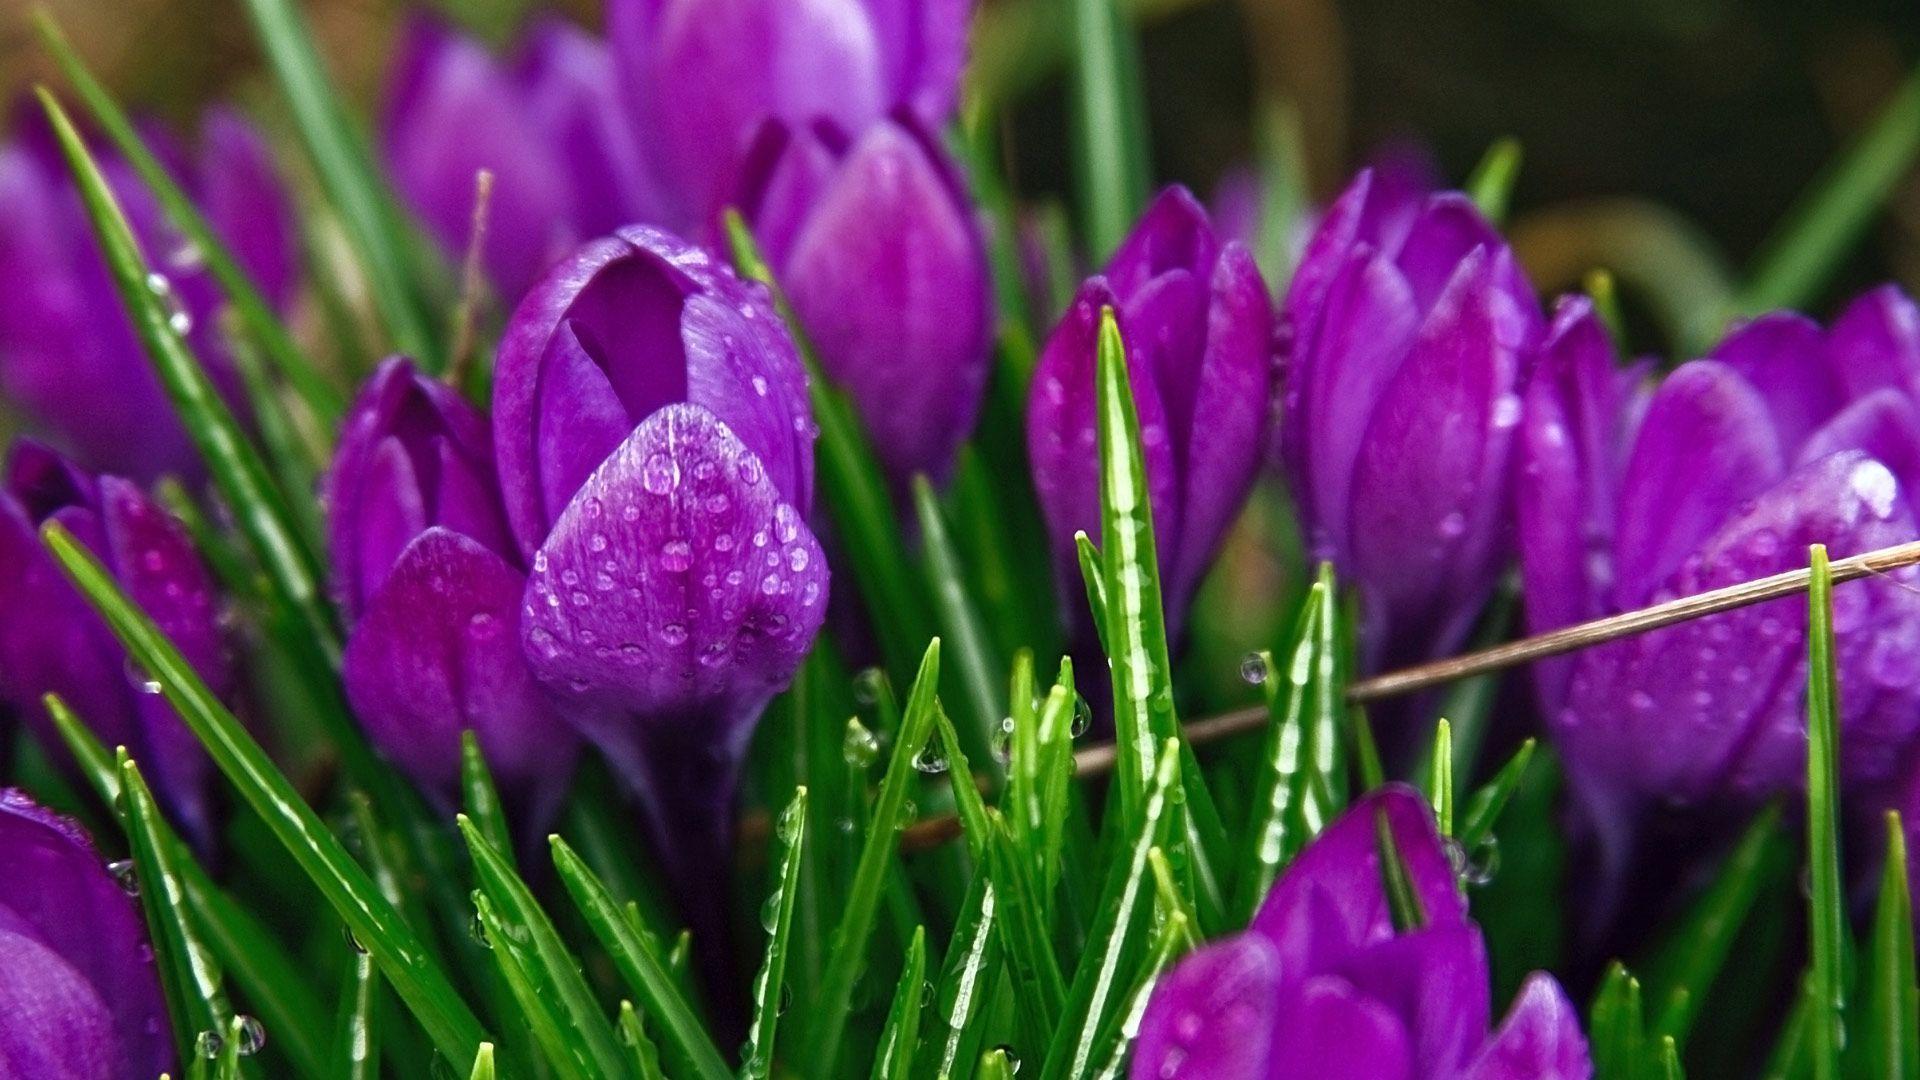 Purple Strange Flowers Wallpapers | HD Wallpapers